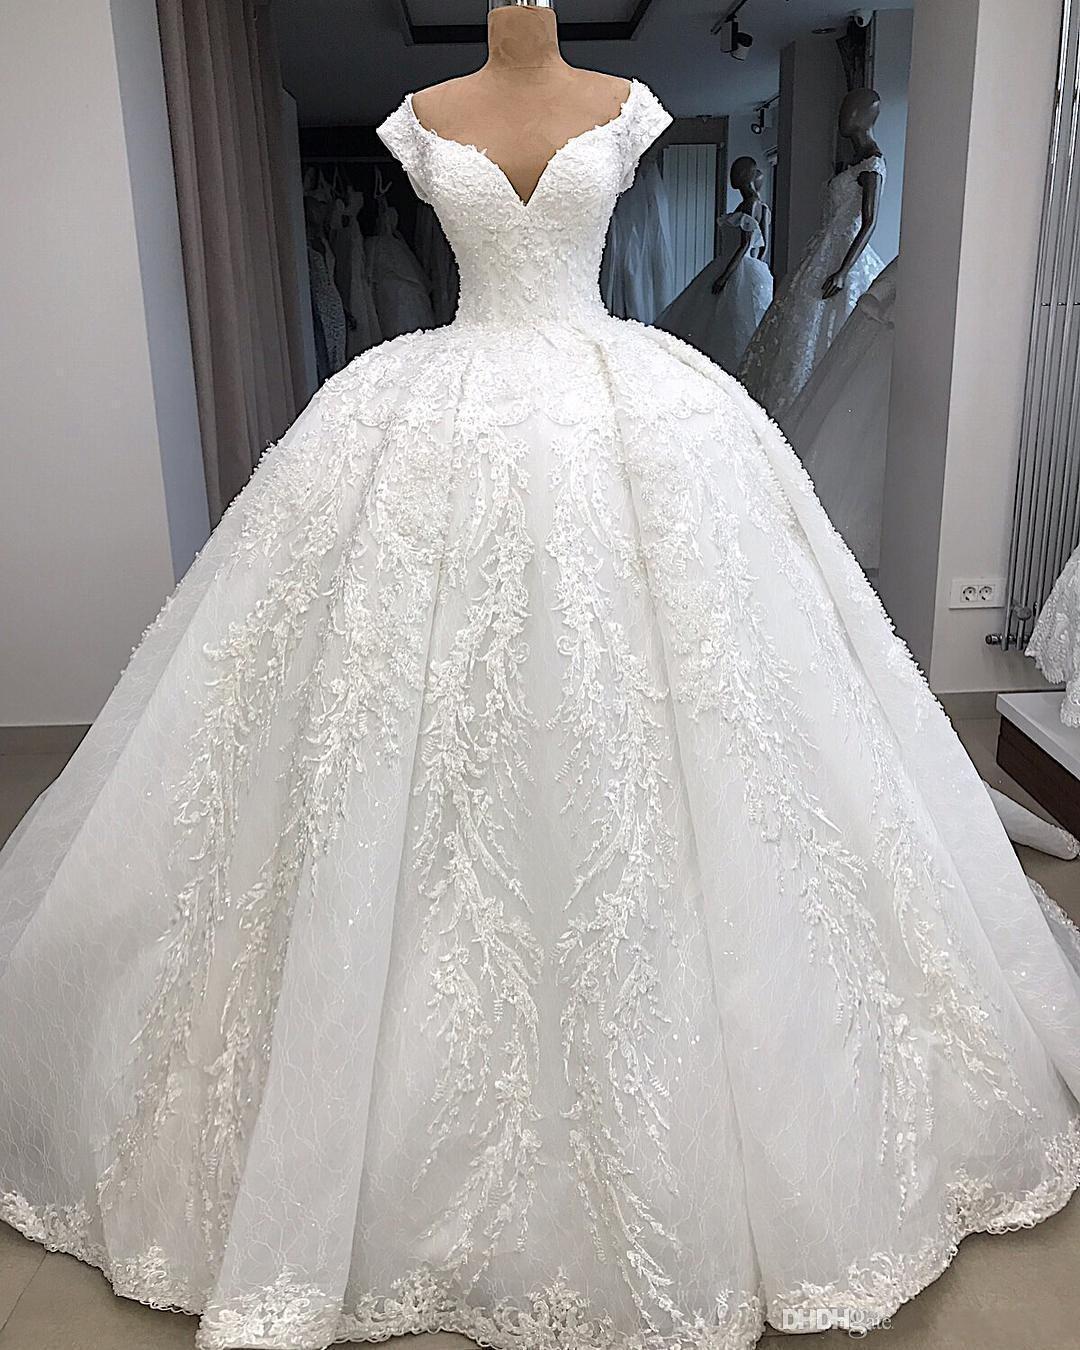 Arabic Dubai Princess Ball Gown Wedding Dresses Bridal Gowns V Neck Lace Applique robe abito da sposa Plus Size vestido de novia